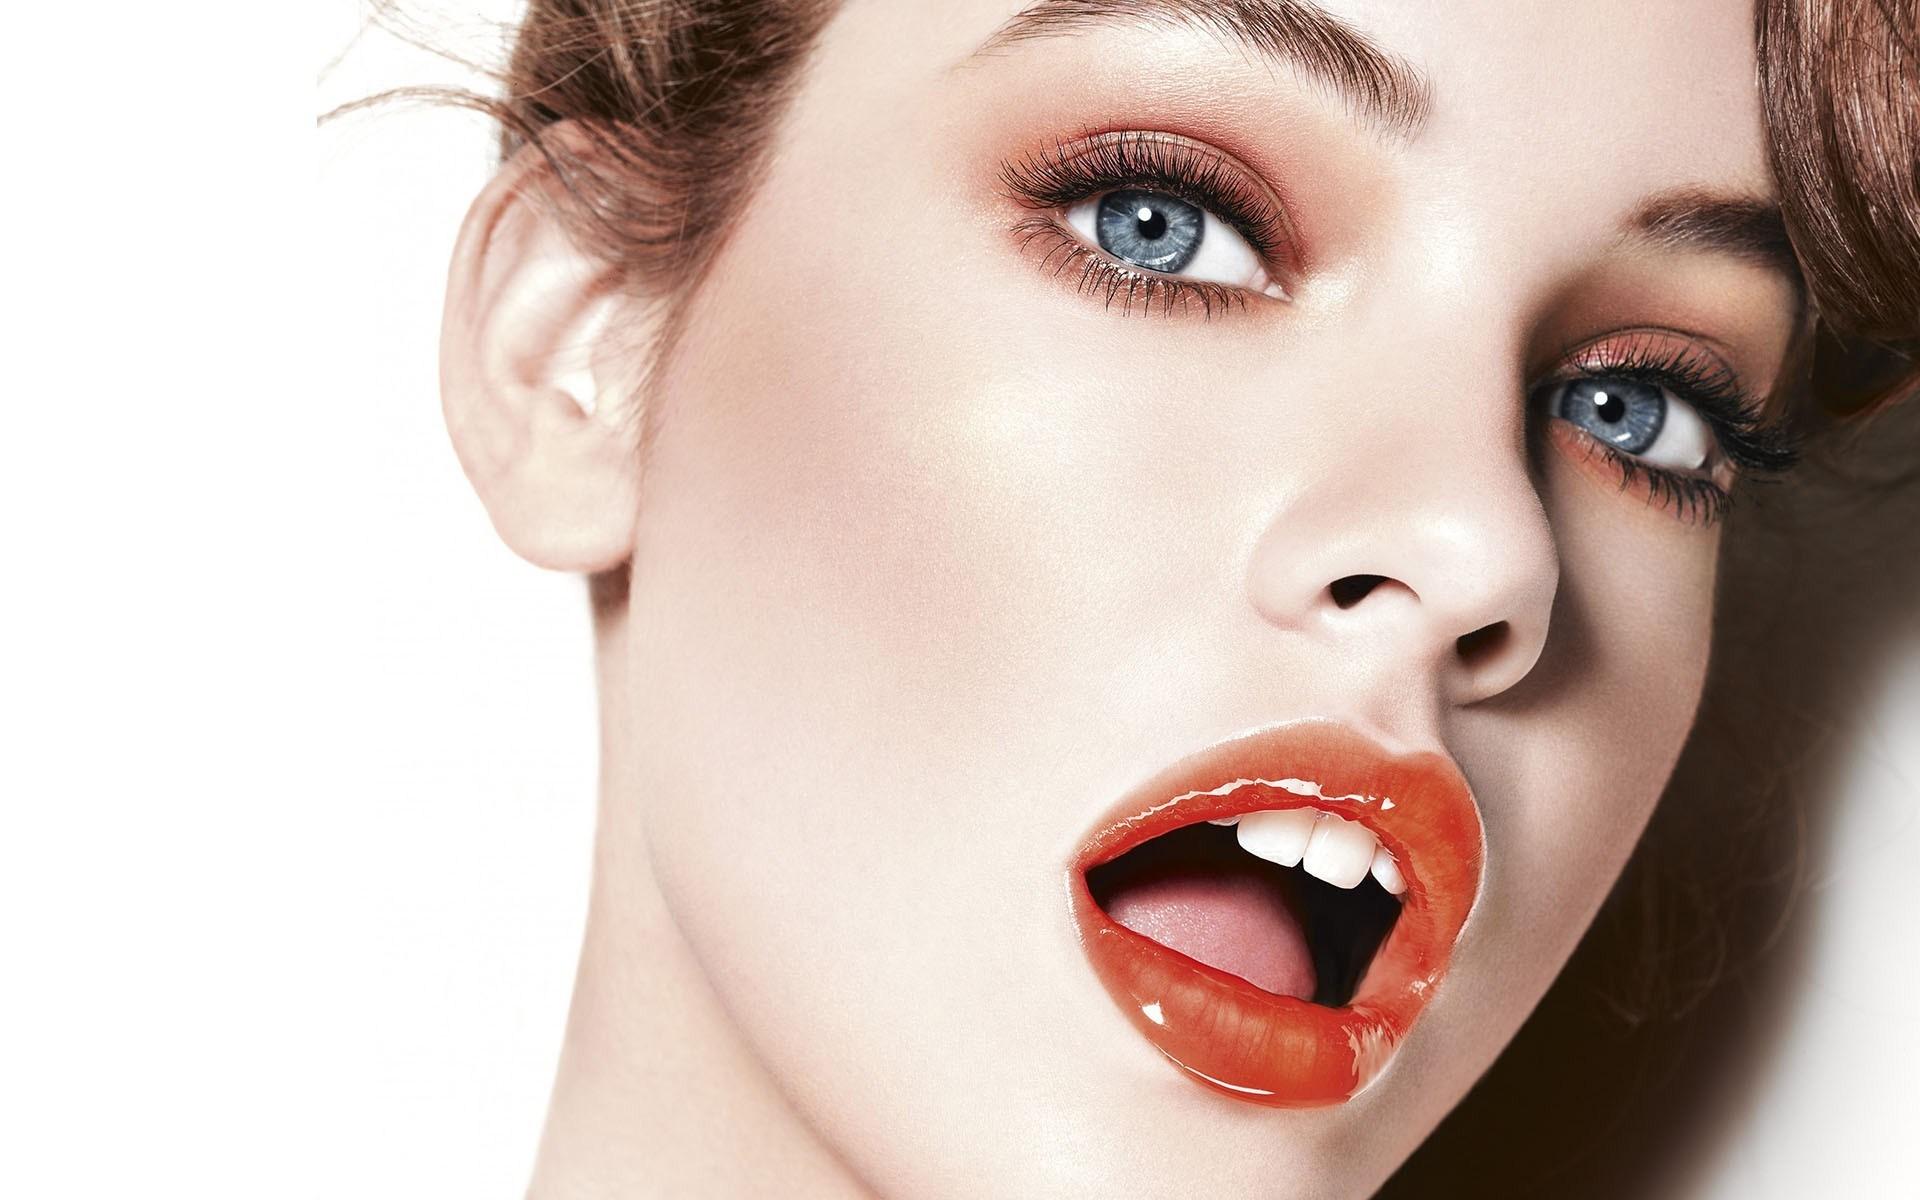 Portrait Barbara Palvin Fashion Model Girl